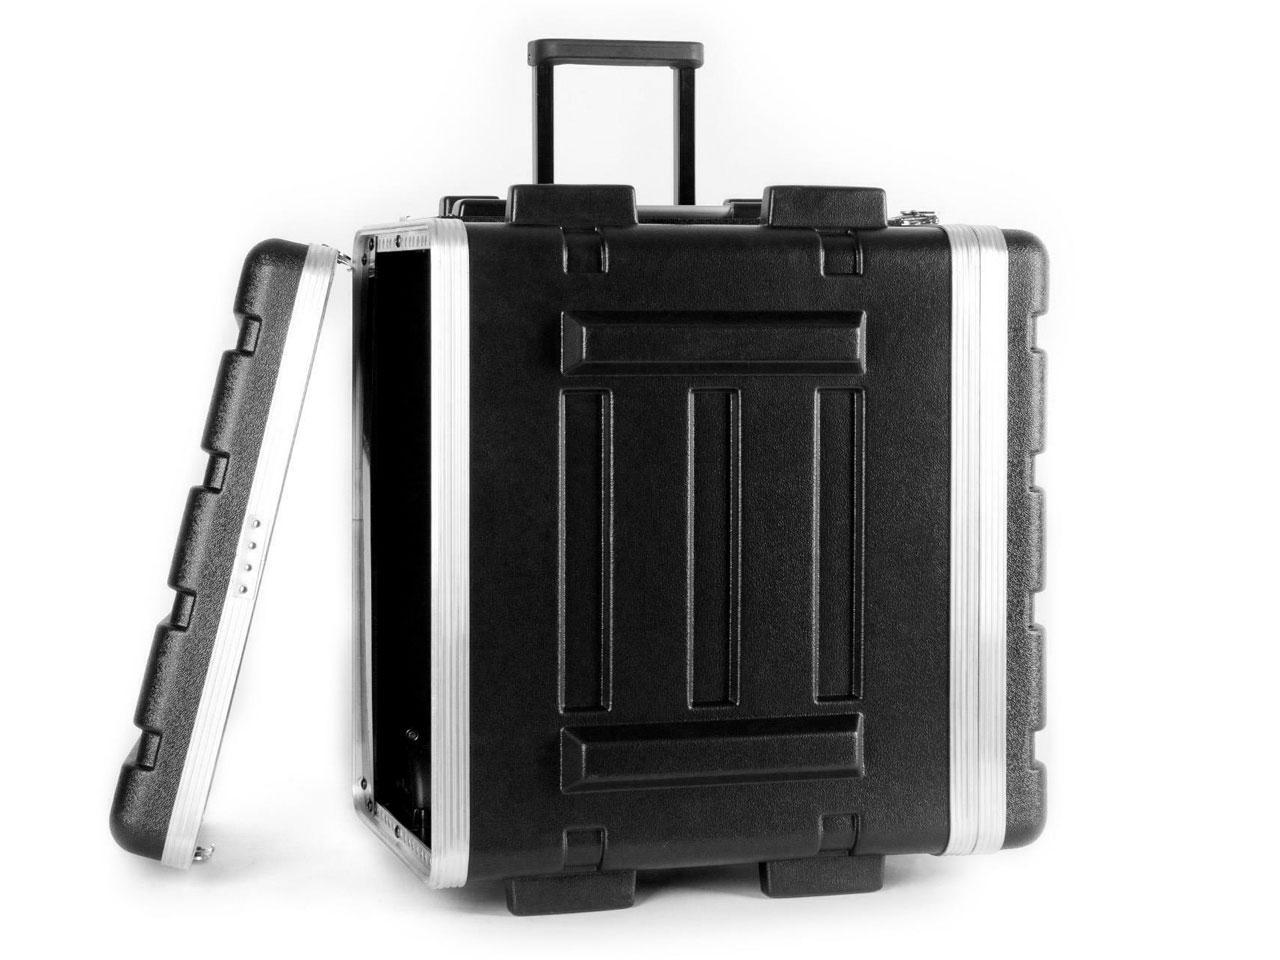 Úložný box FRONTSTAGE ABS-Trolley flightcase + záruka 3 roky!